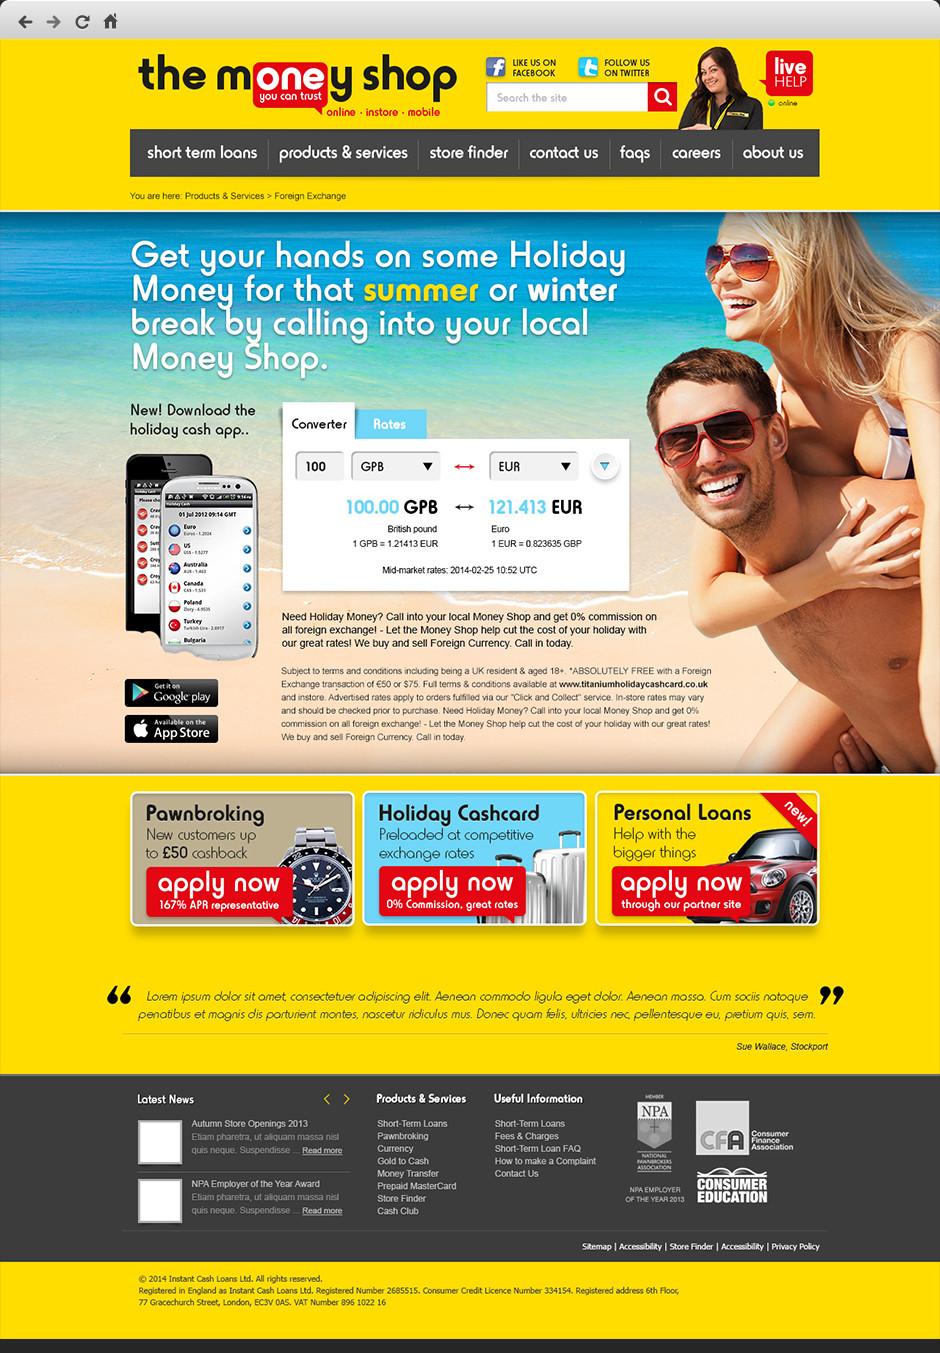 The Money Shop Website Rebrand